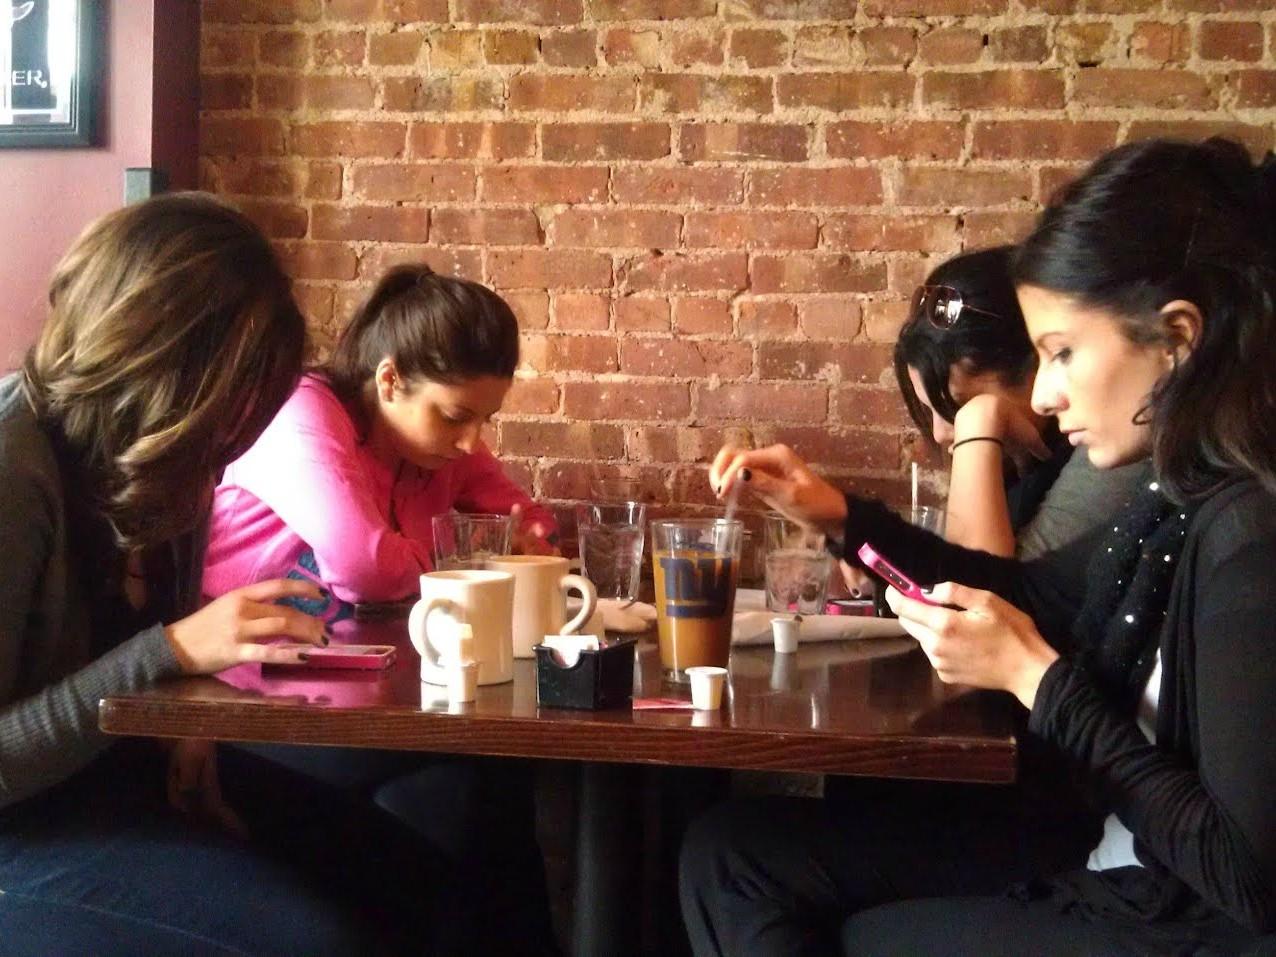 Business smartphone etiquette